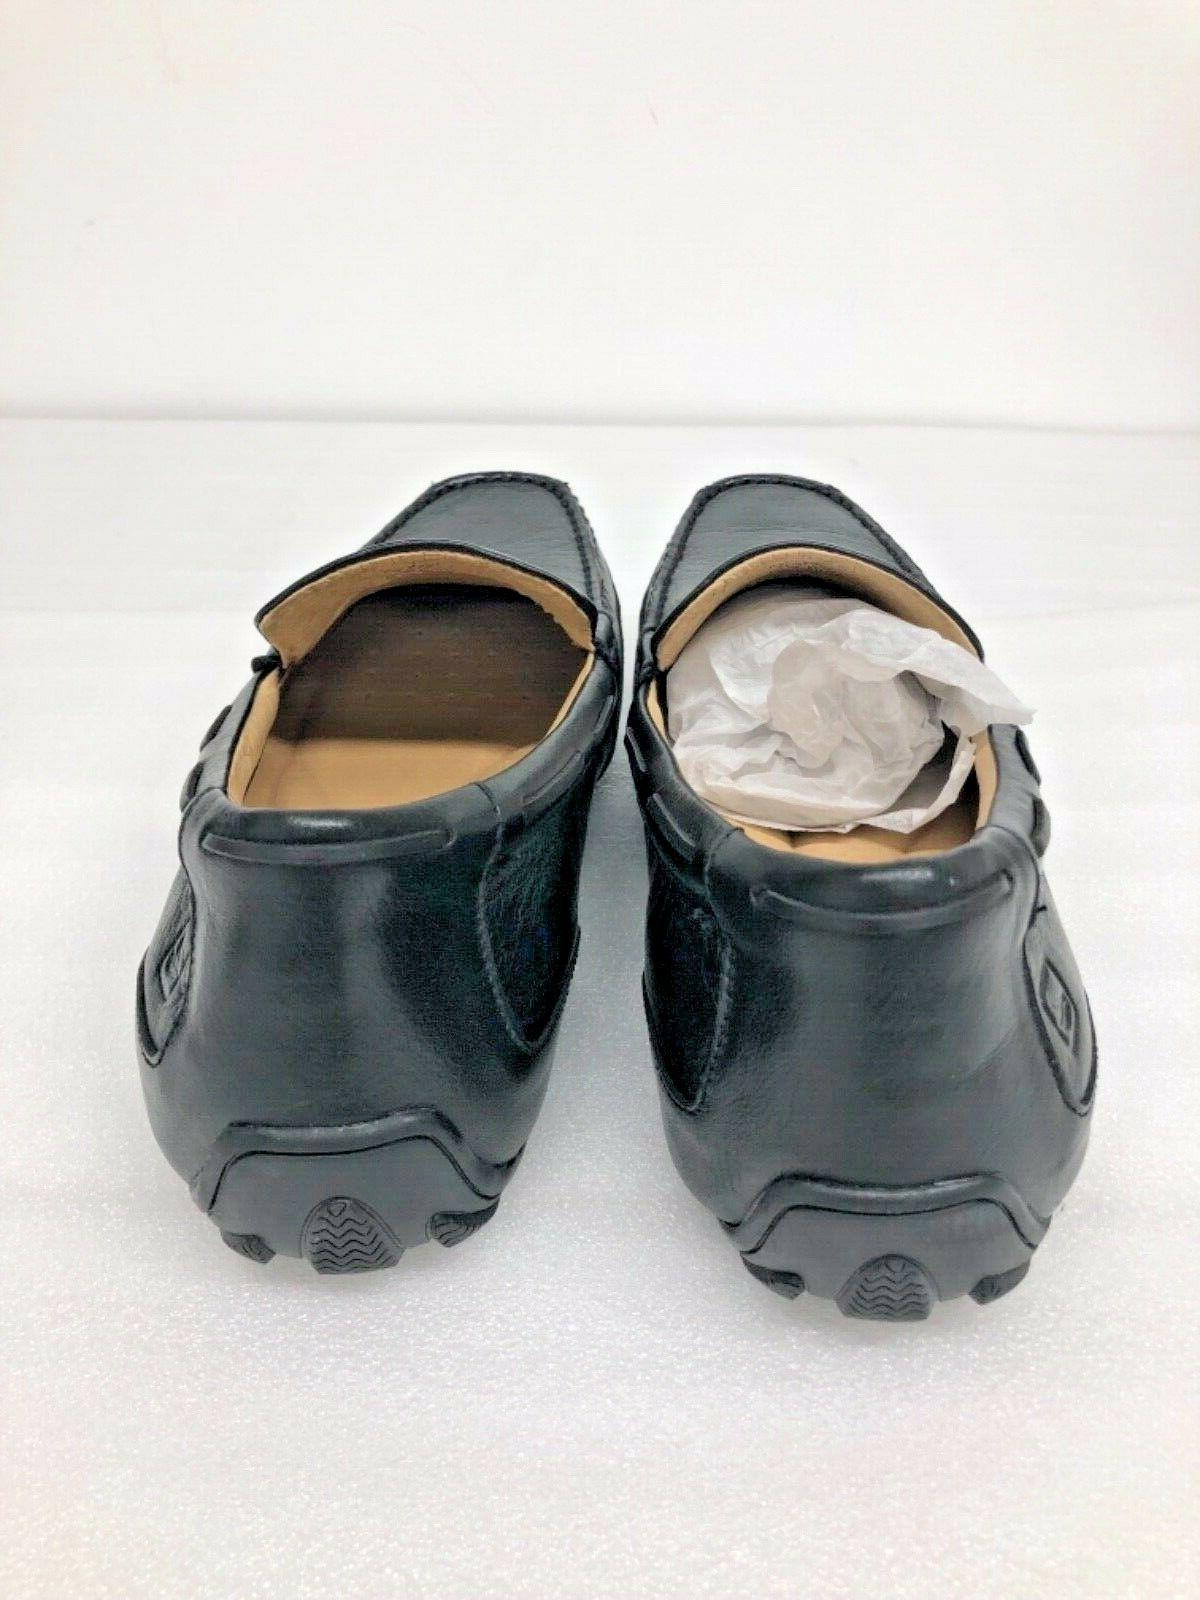 $90 Shoes Size